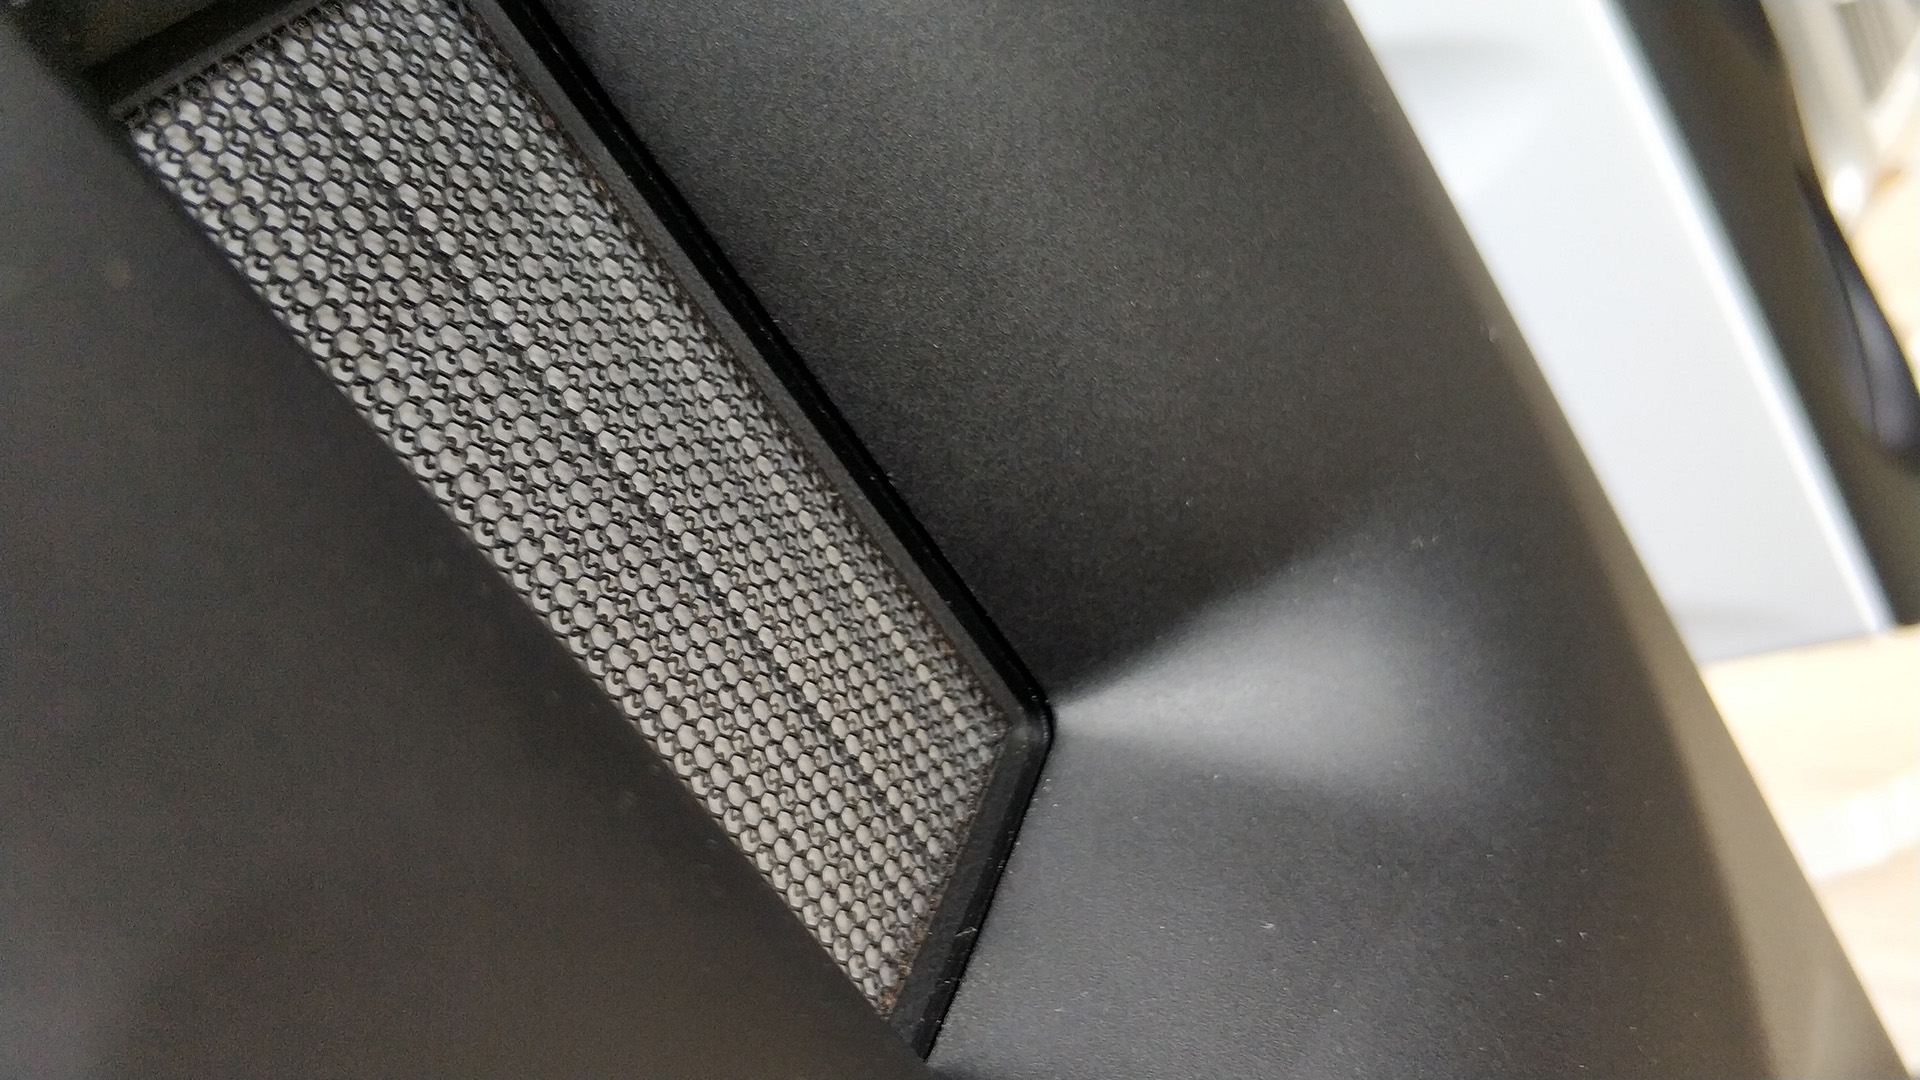 Завершающий штрих: полутораметровая колонка Børresen Z5 – венец линейки Z